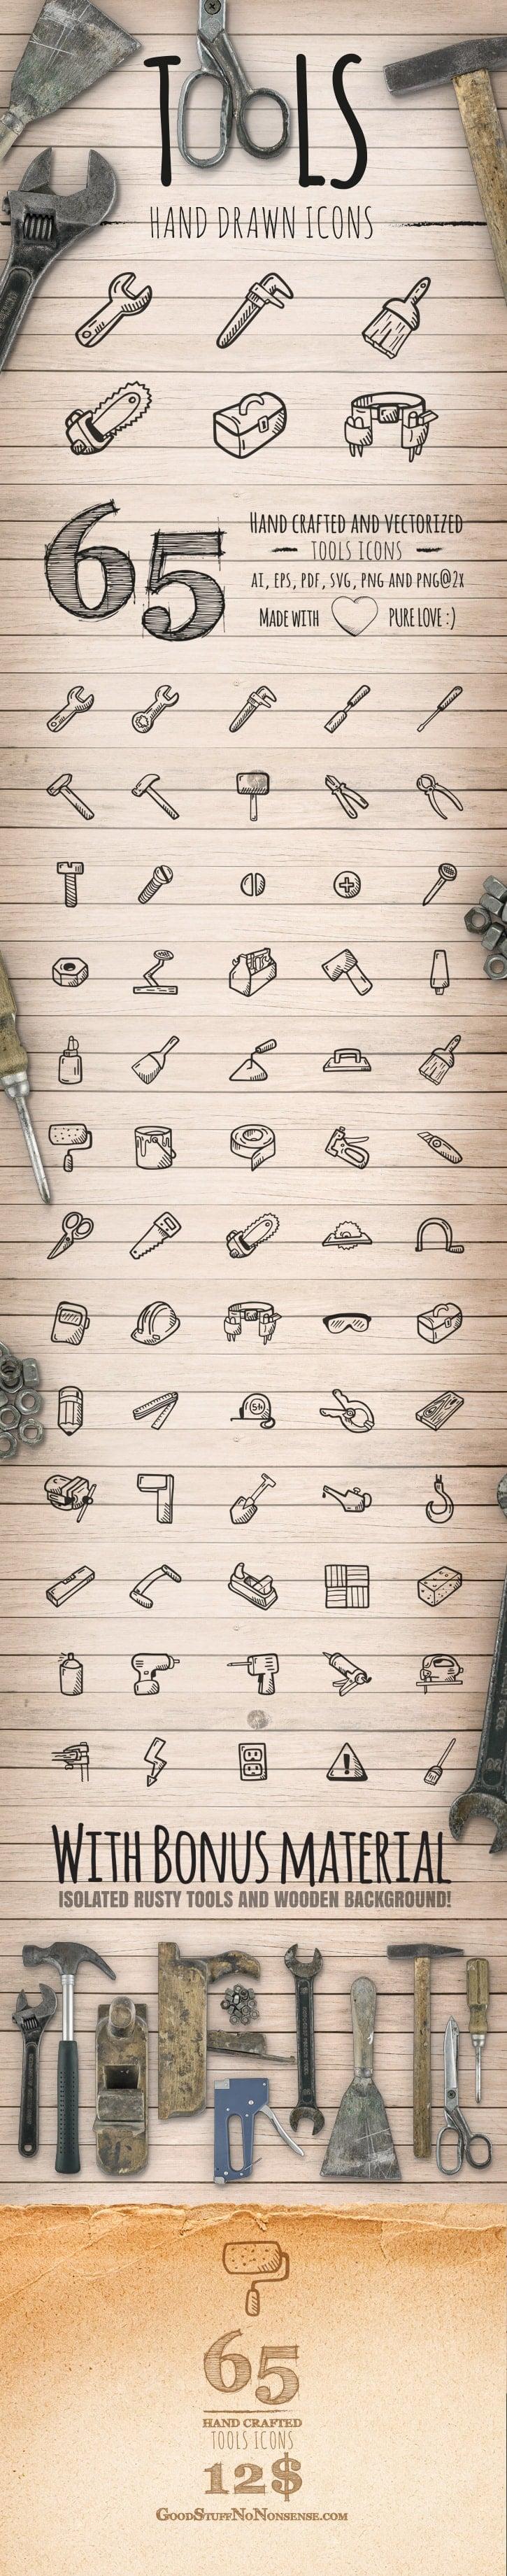 Tools Icons - Hand Drawn Icons